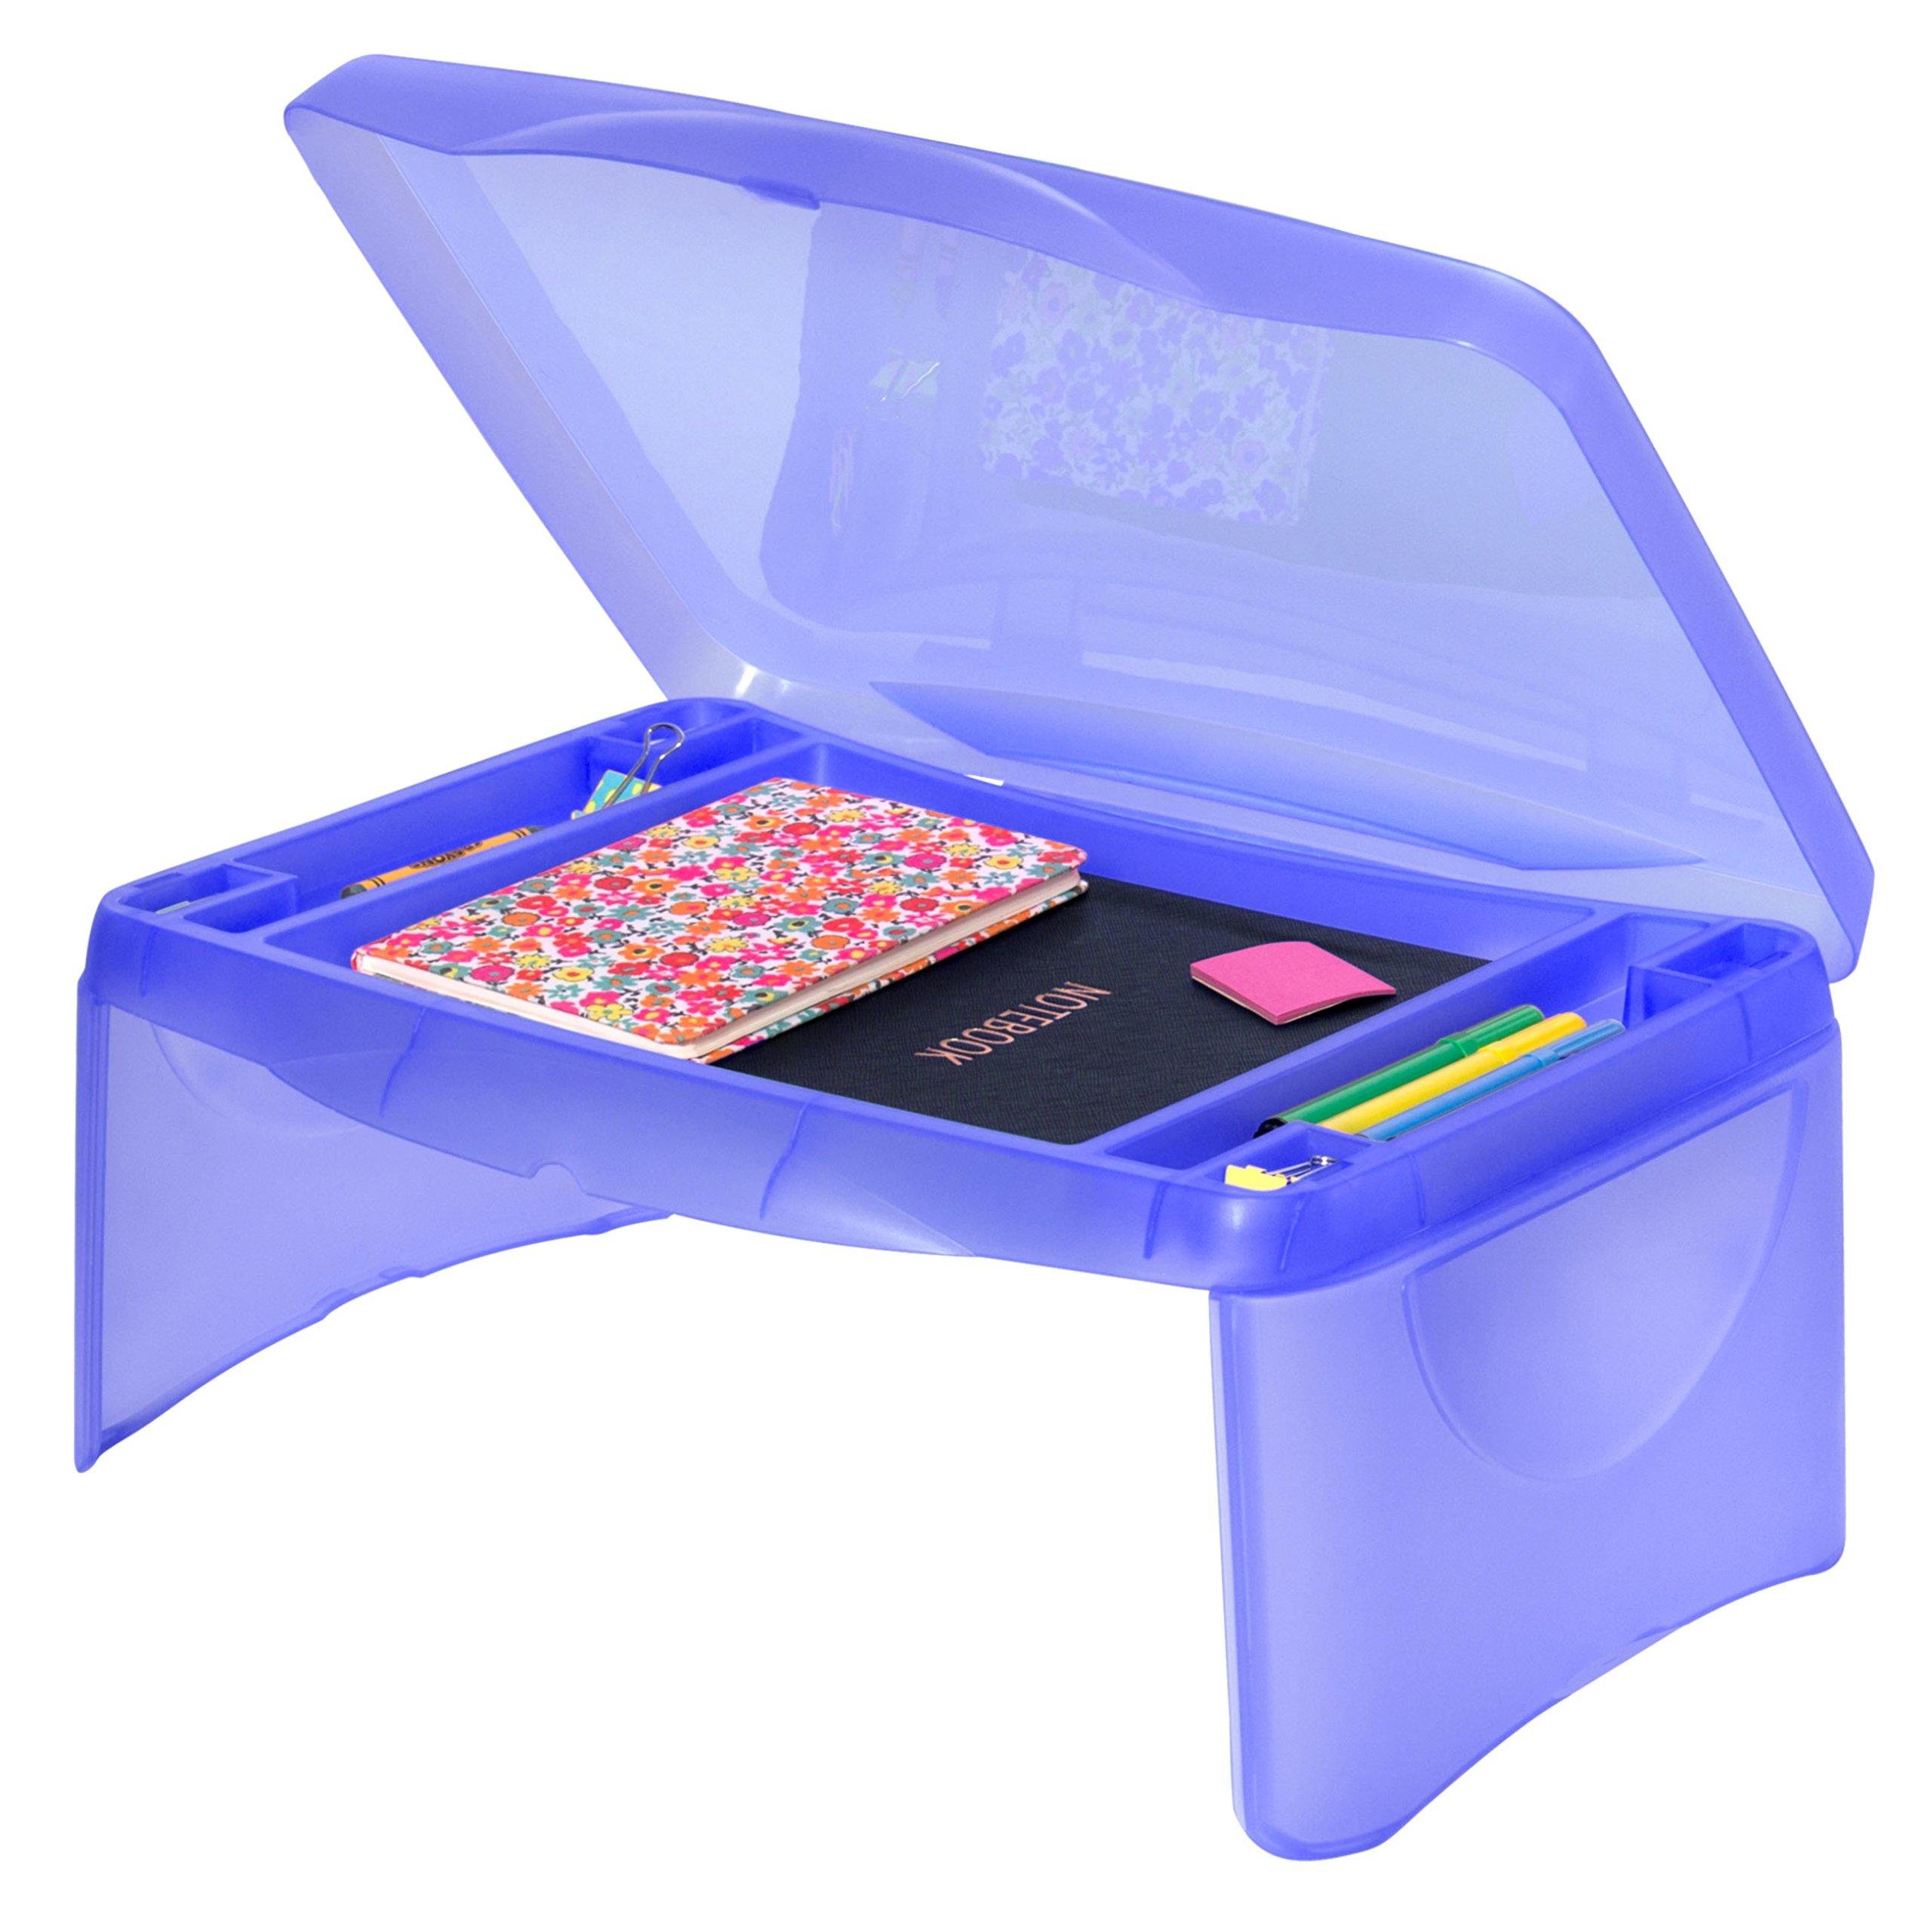 Best Choice Products Kids Folding Lap Desk W/Storage- Blue